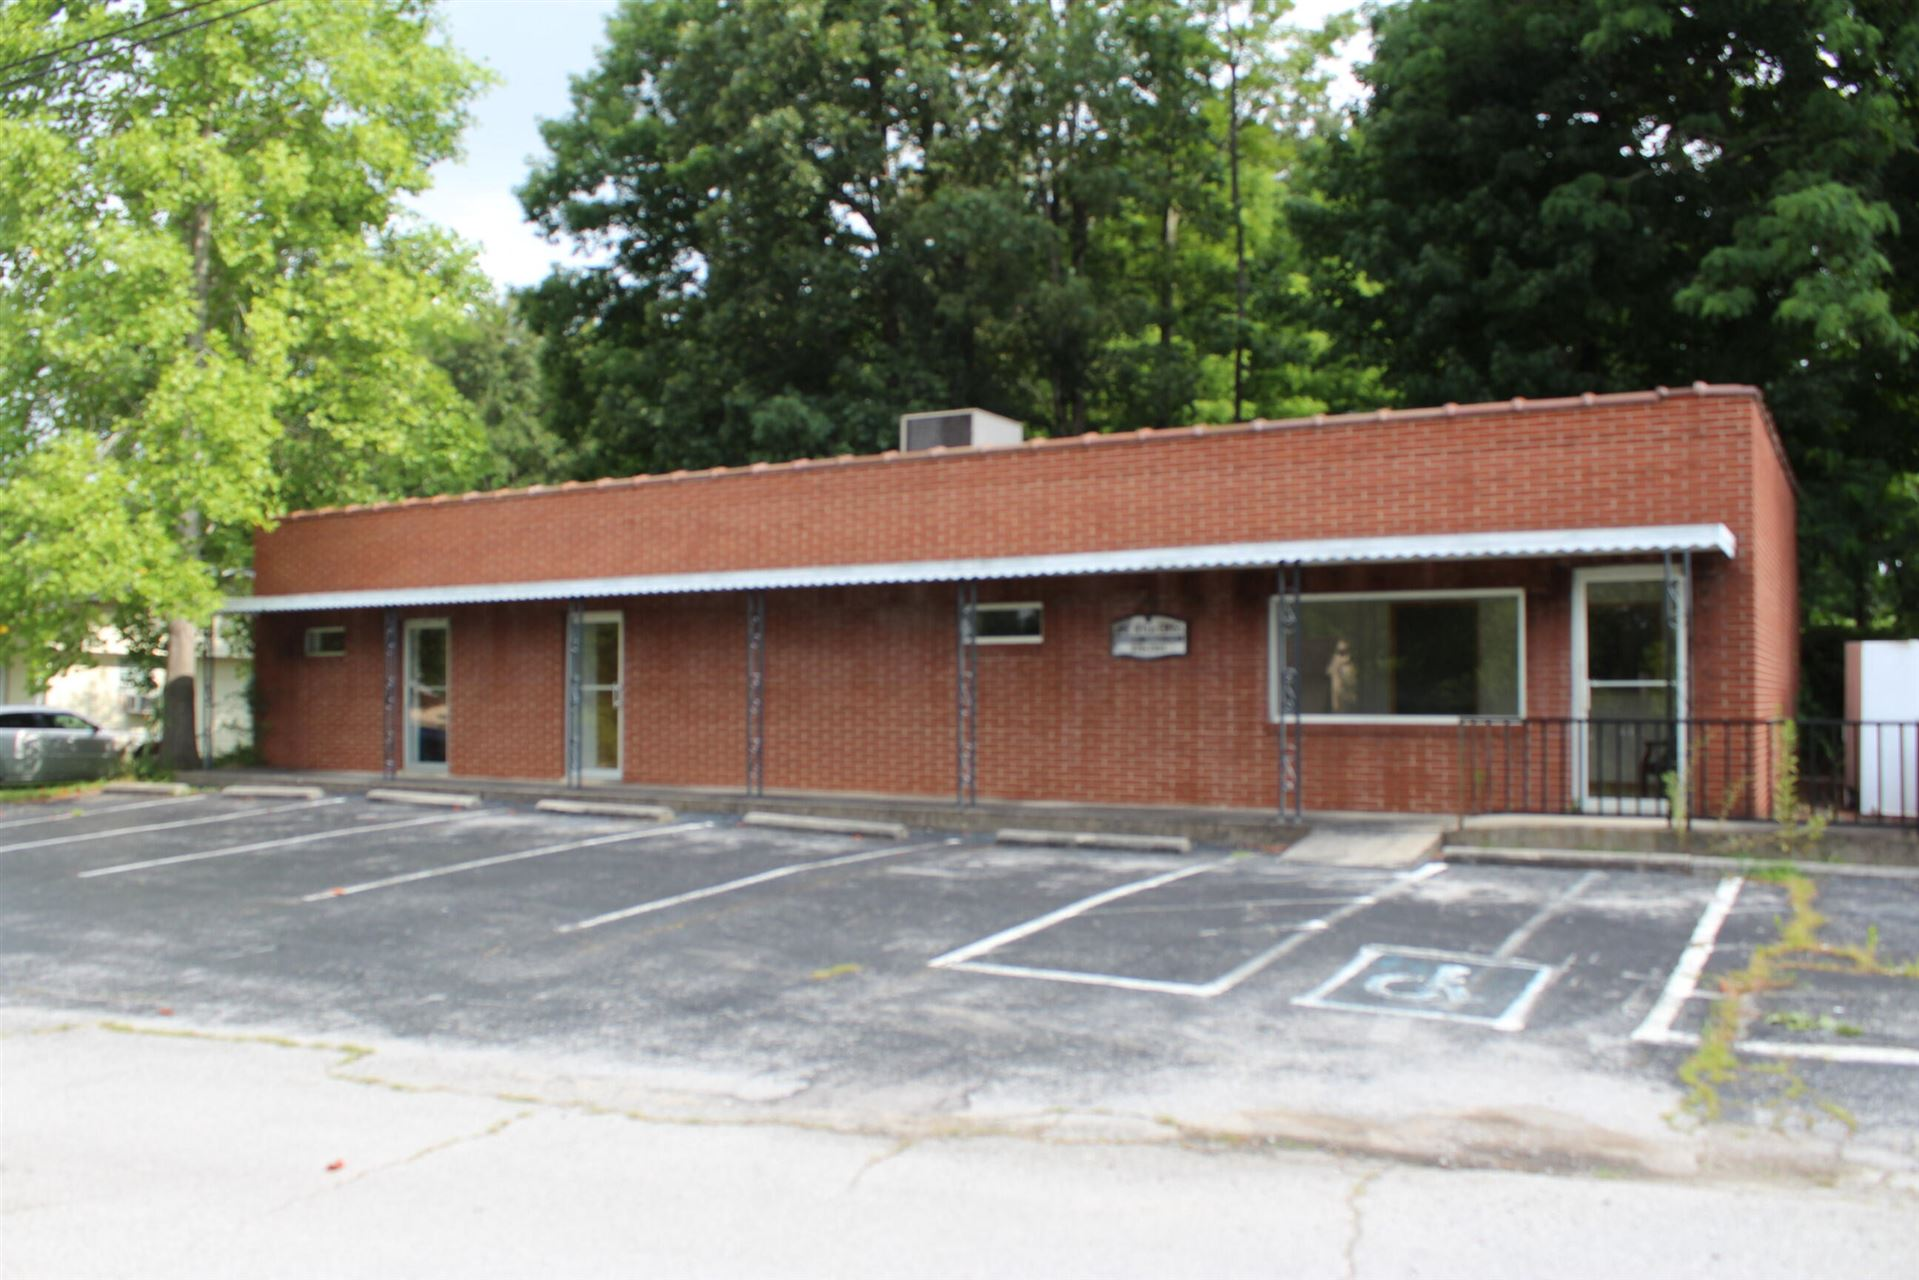 Photo of 104 Reagan Ave, Jamestown, TN 38556 (MLS # 1159751)